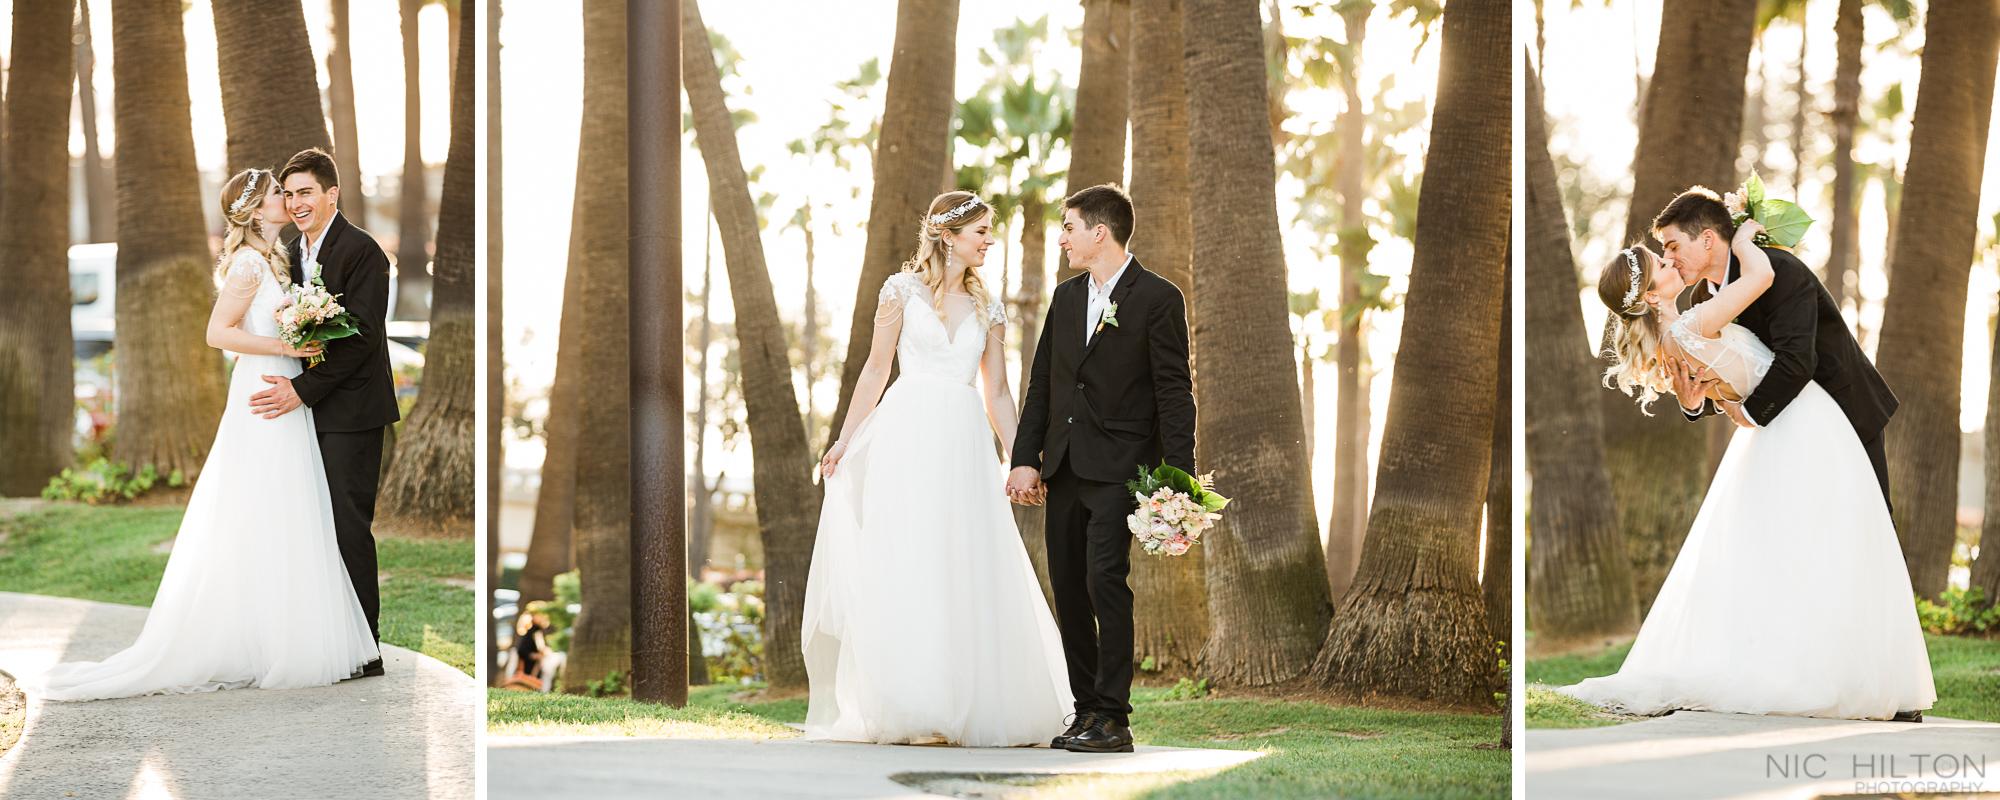 Bride-And-Groom-Hotel-Maya-Long-Beach-Wedding.jpg